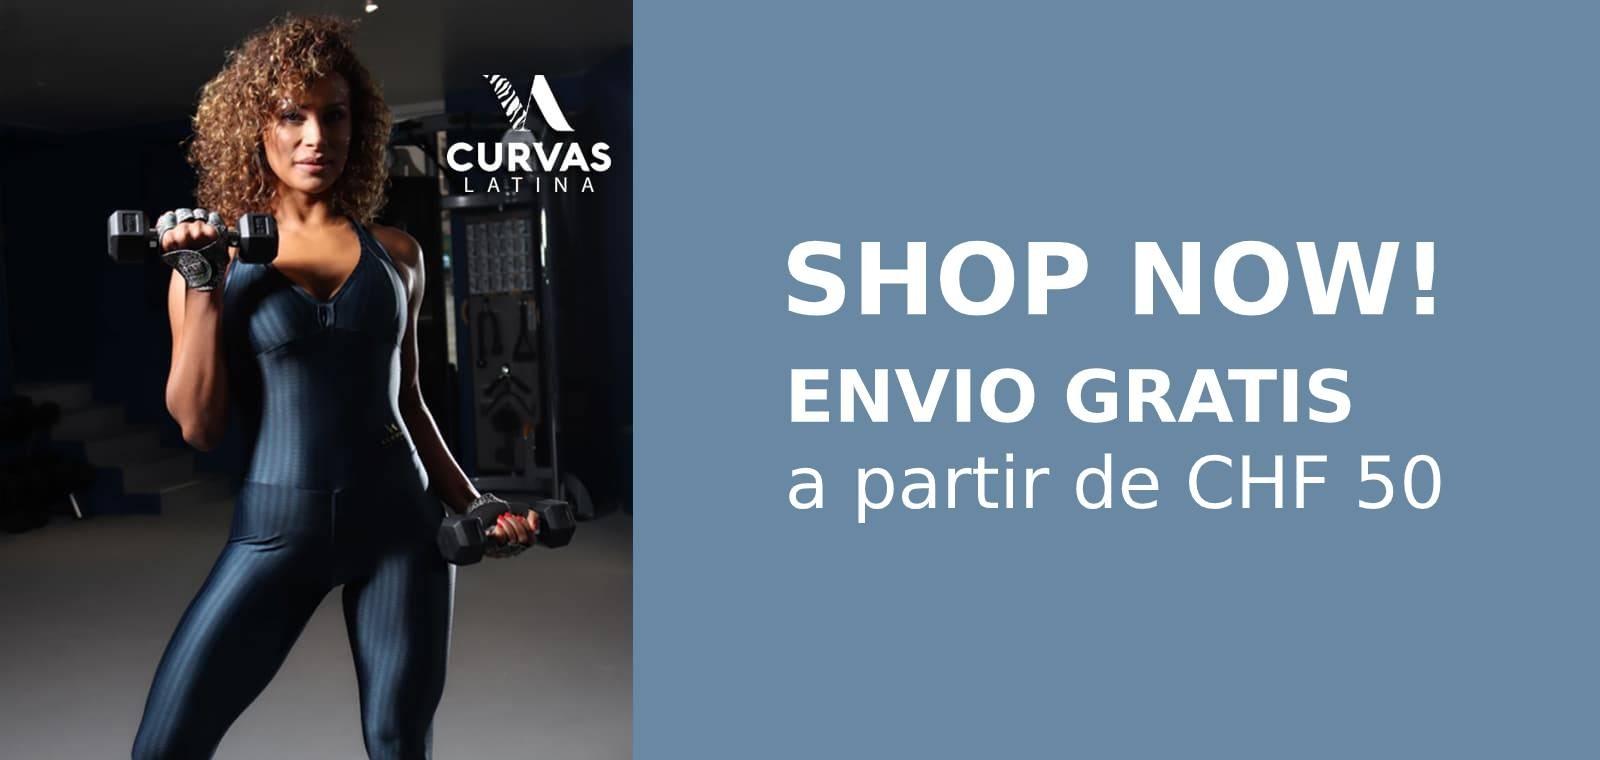 ropa-fitness-mujer-enterizos-curvas-latina